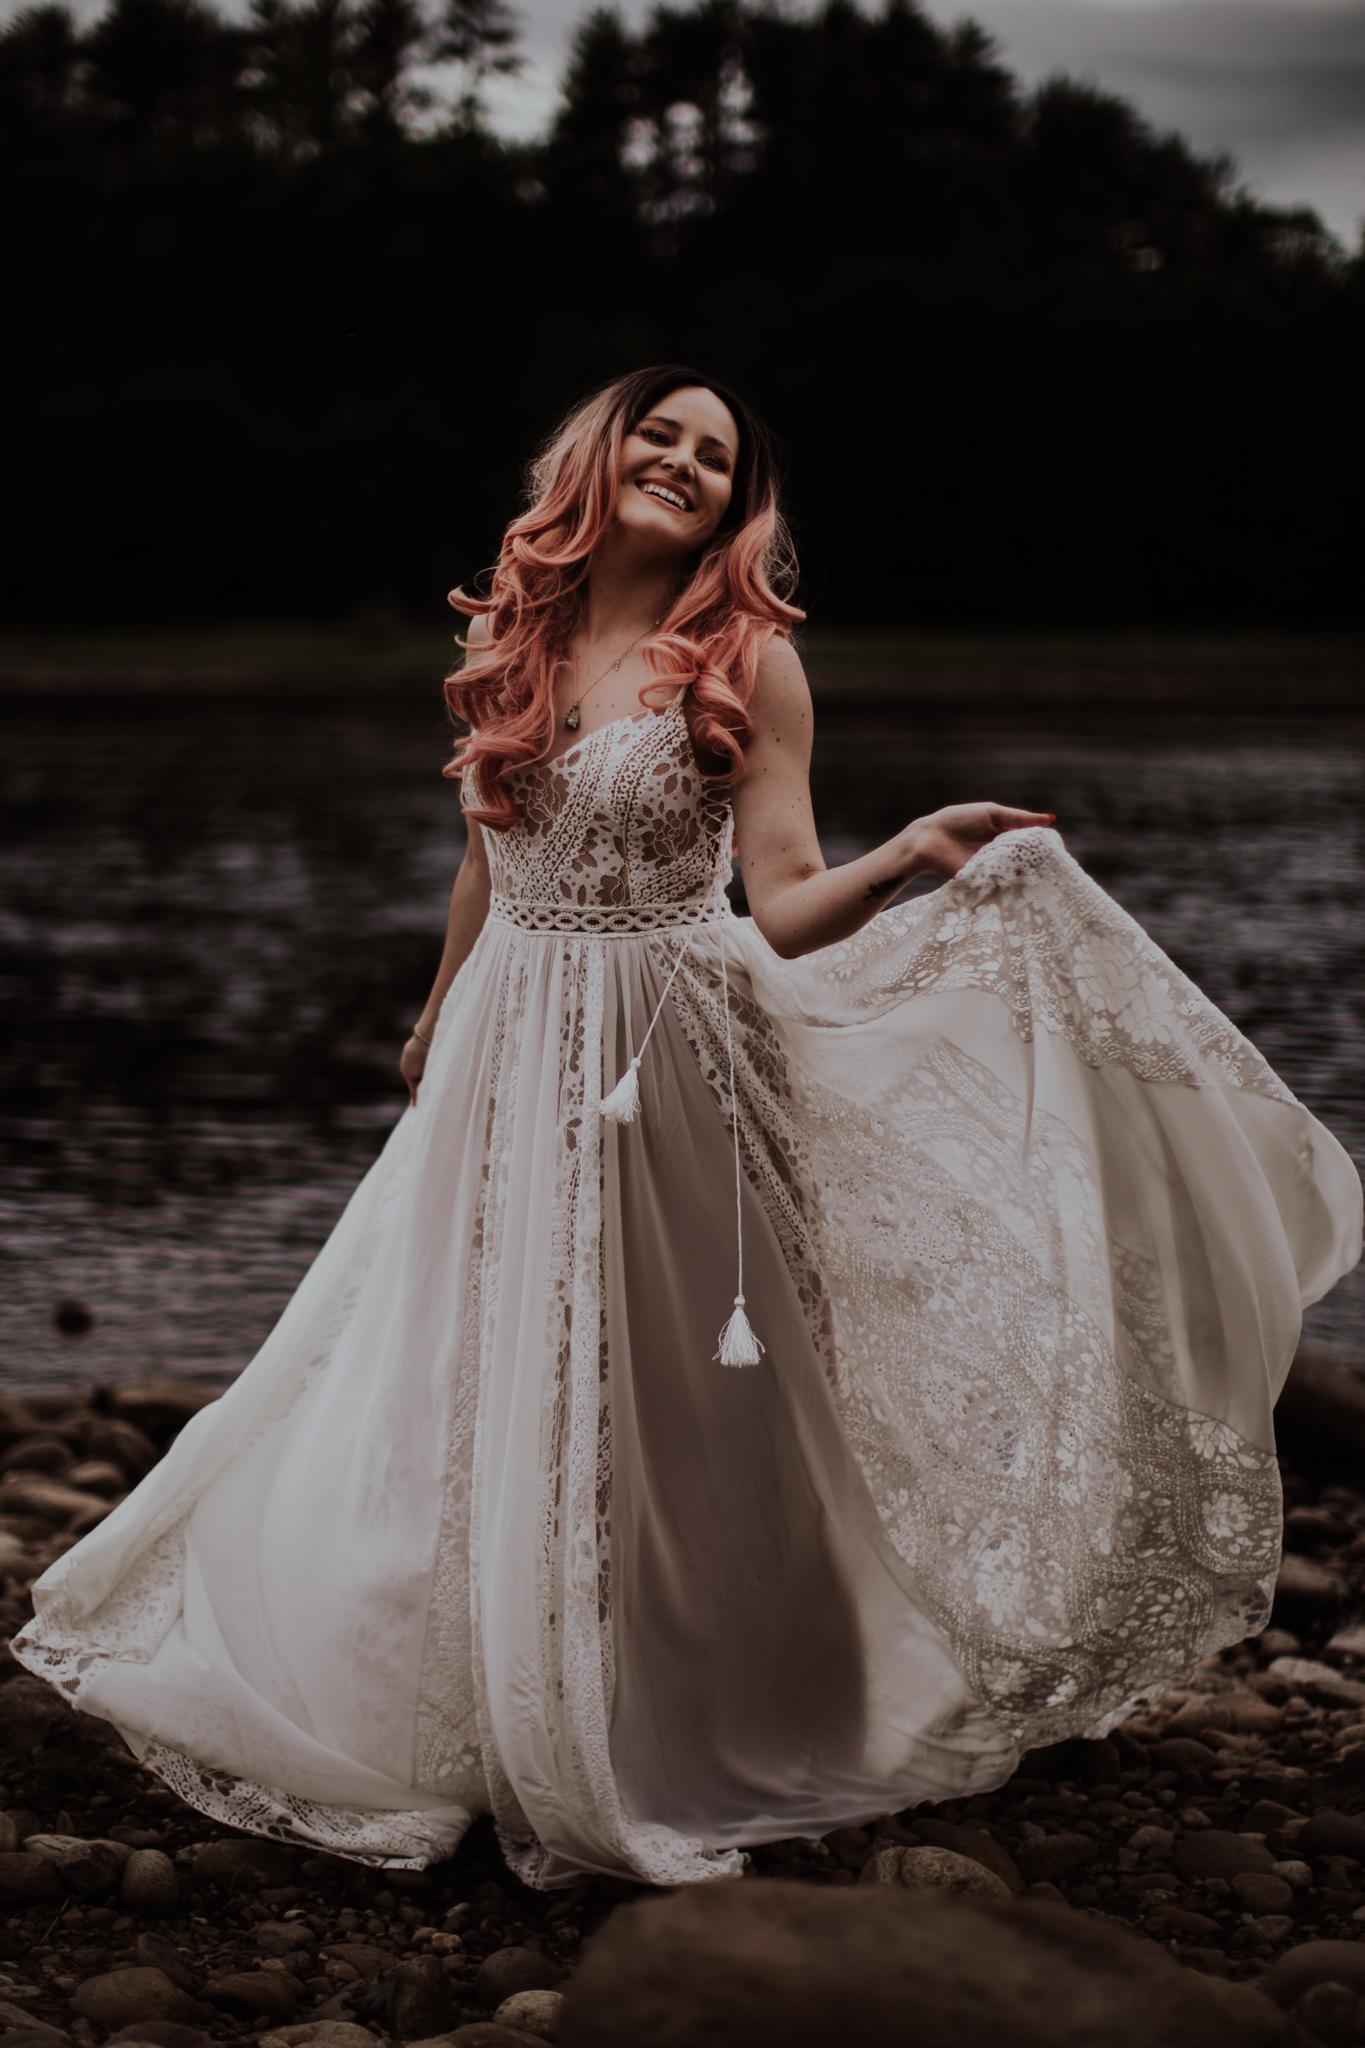 lovelybonesstudio_bridalphotography-4.jpg